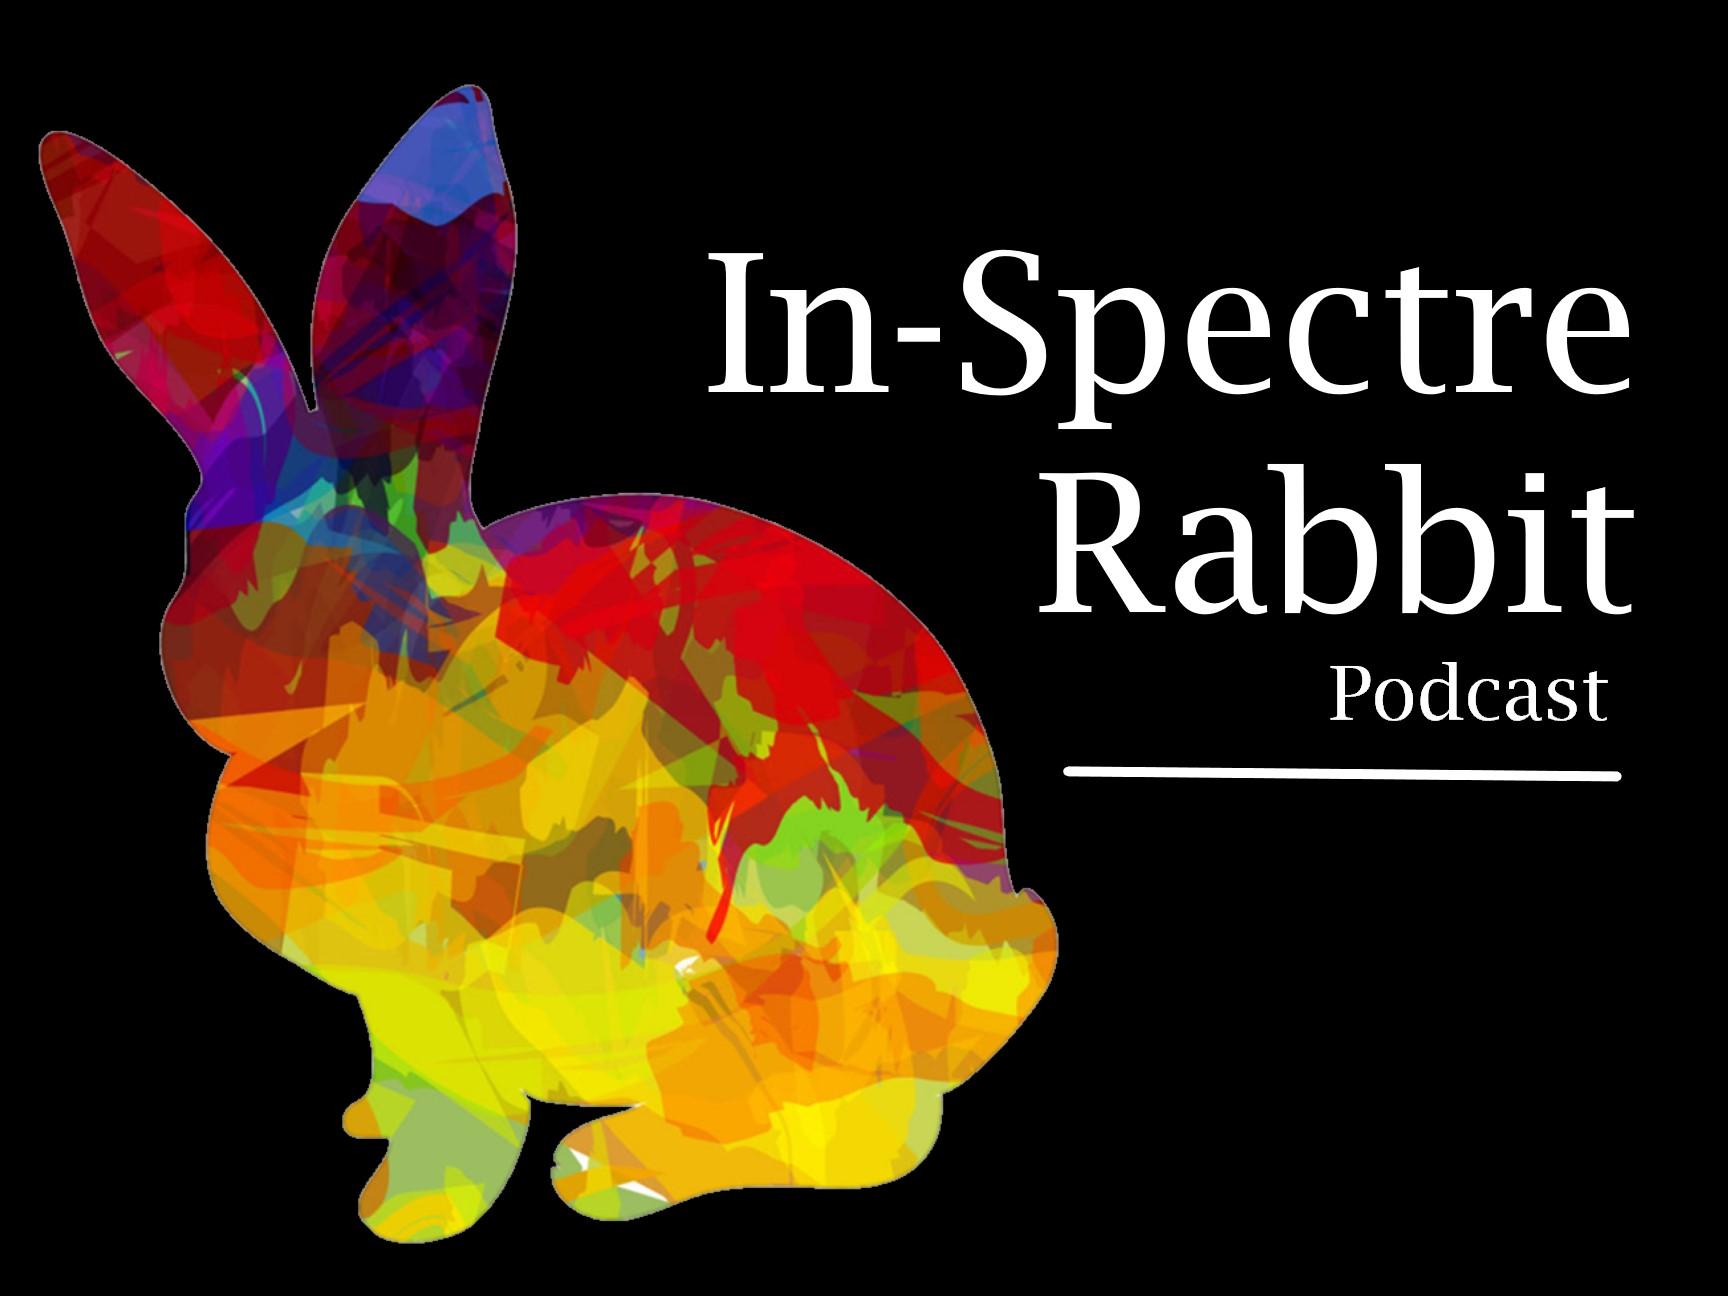 In-Spectre Rabbit podcast